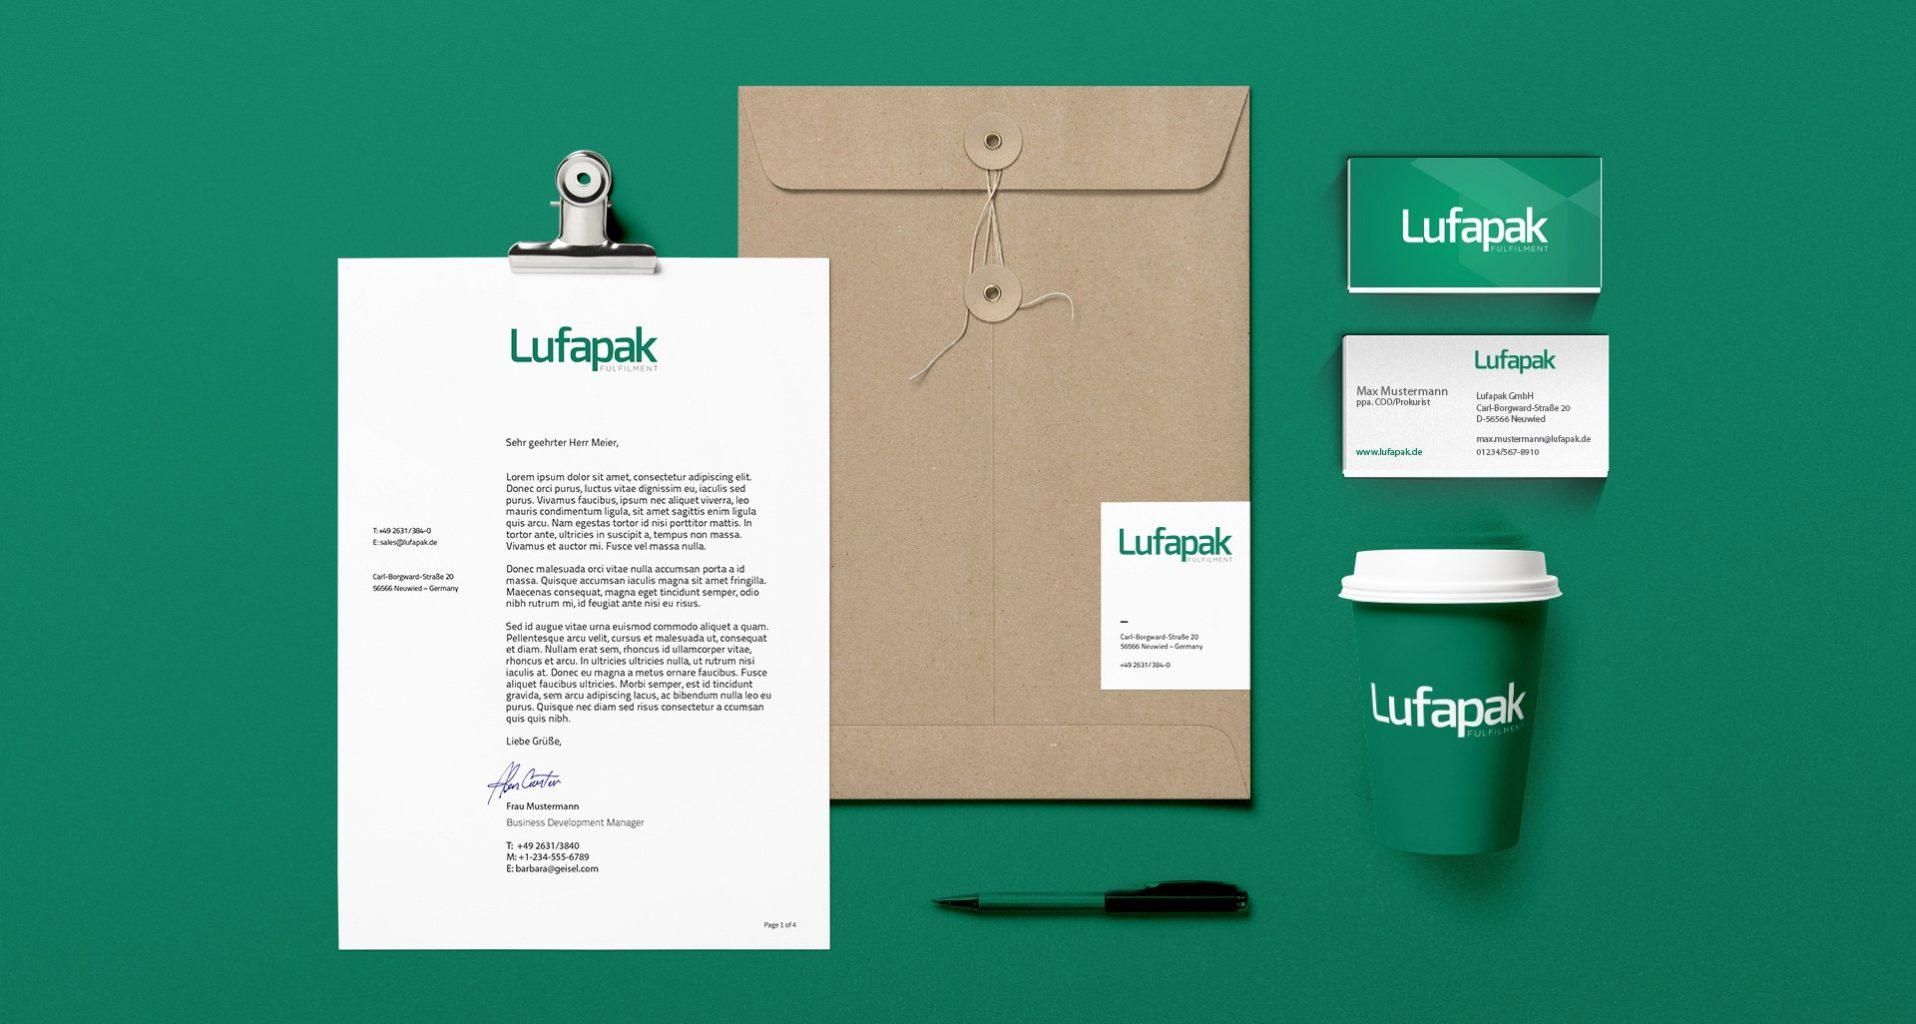 Lufapak-fullfillment-dienstleister-referenz-pictibe-1